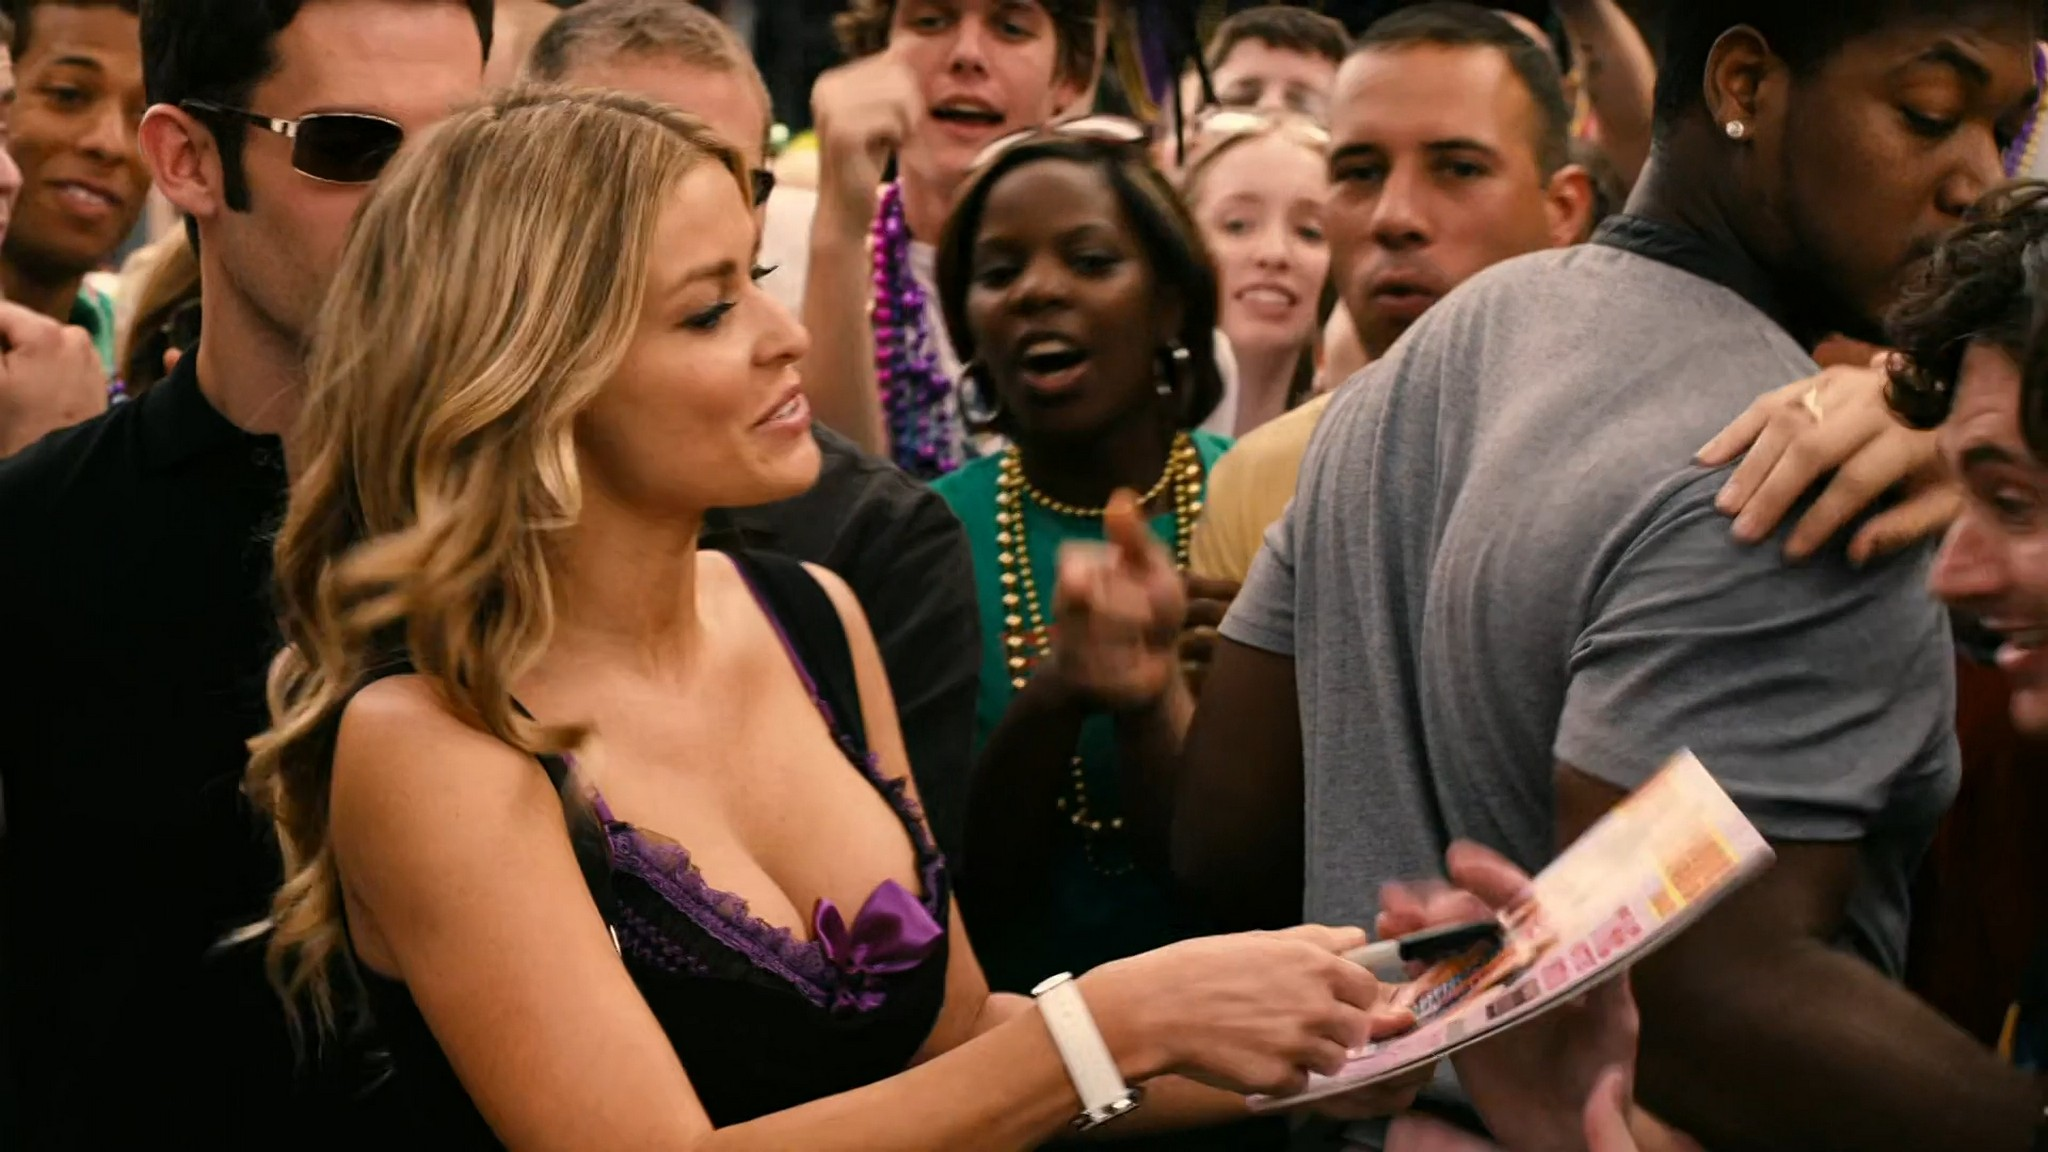 Danneel Ackles nude Carmen Electra, Arielle Kebbel, sexy otherrs nude and hot - Mardi Gras: Spring Break (2011) HD 1080p WEb (30)